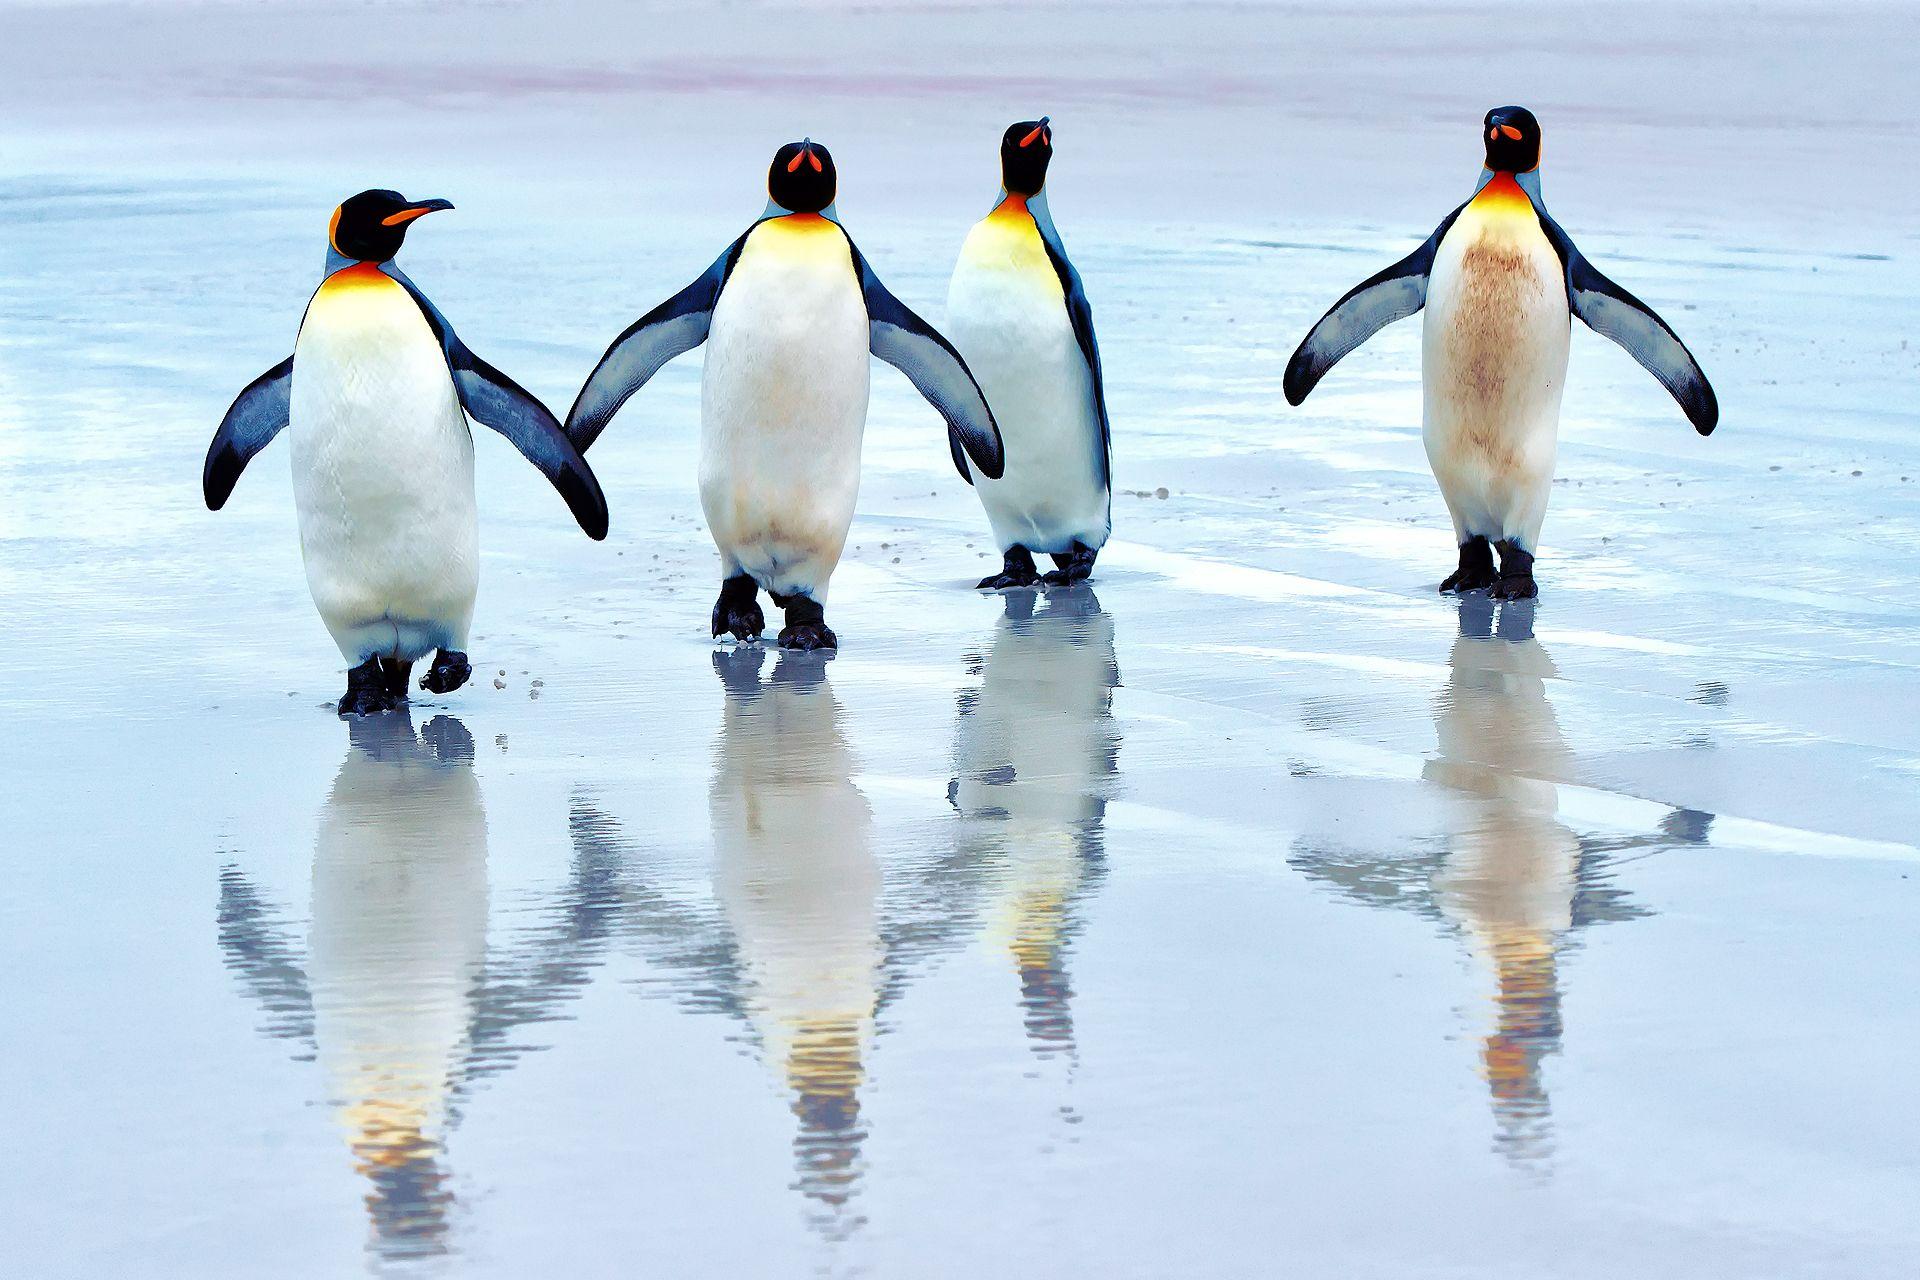 Four Cute Penguin Wallpaper For Windows Ahaa Penguins Penguin 1920x1280